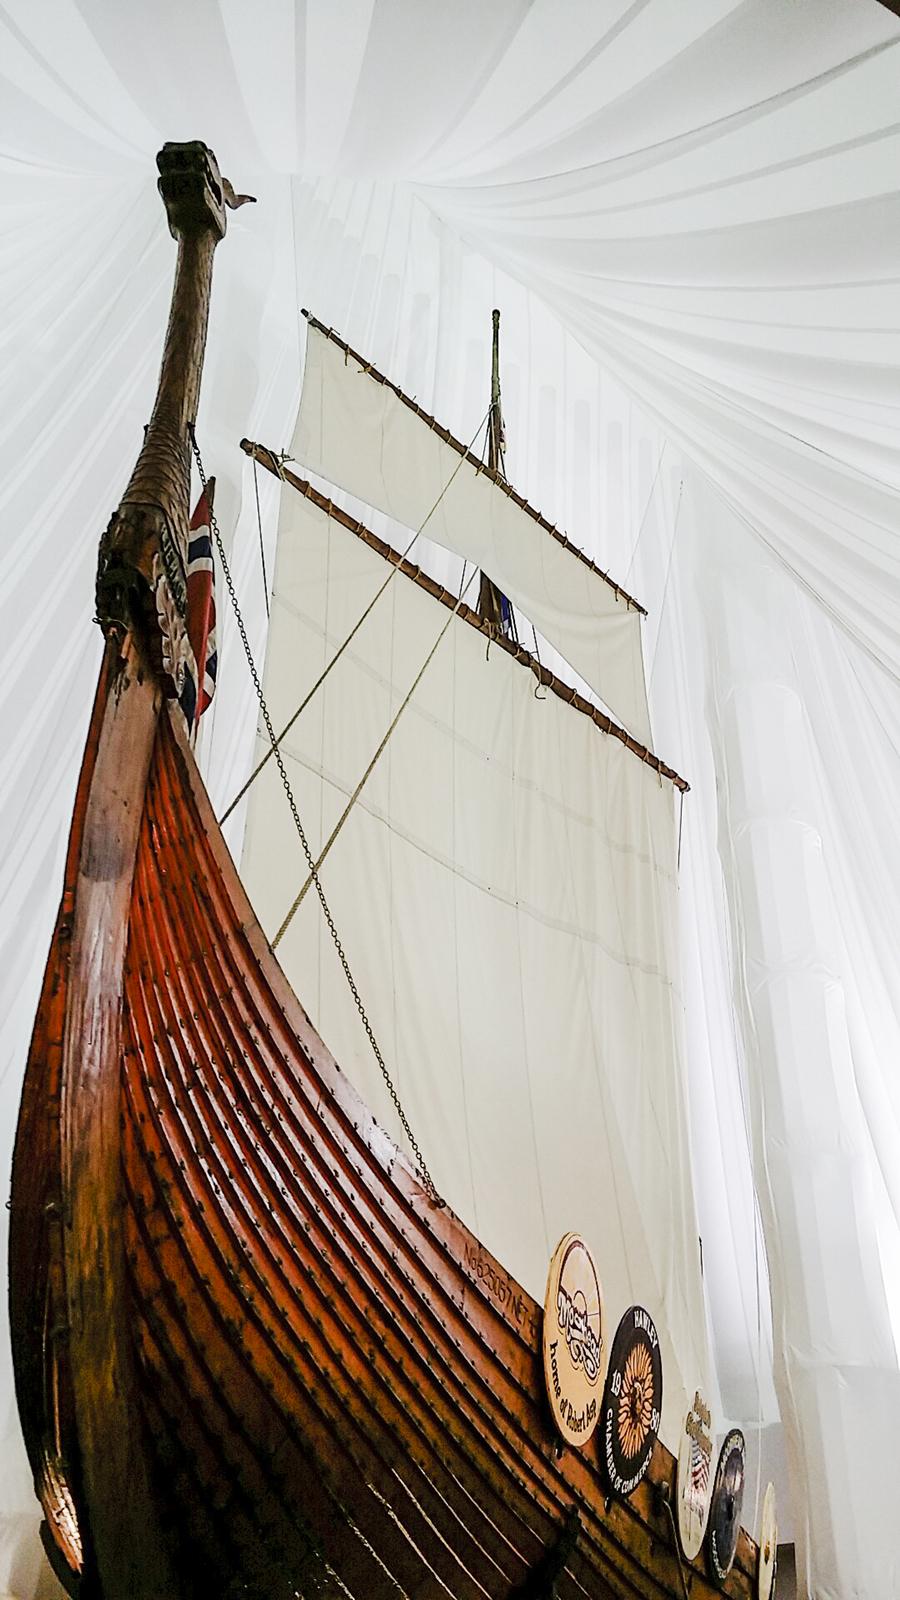 The Hjemkomst in a museum in Moorhead, Minnesota.